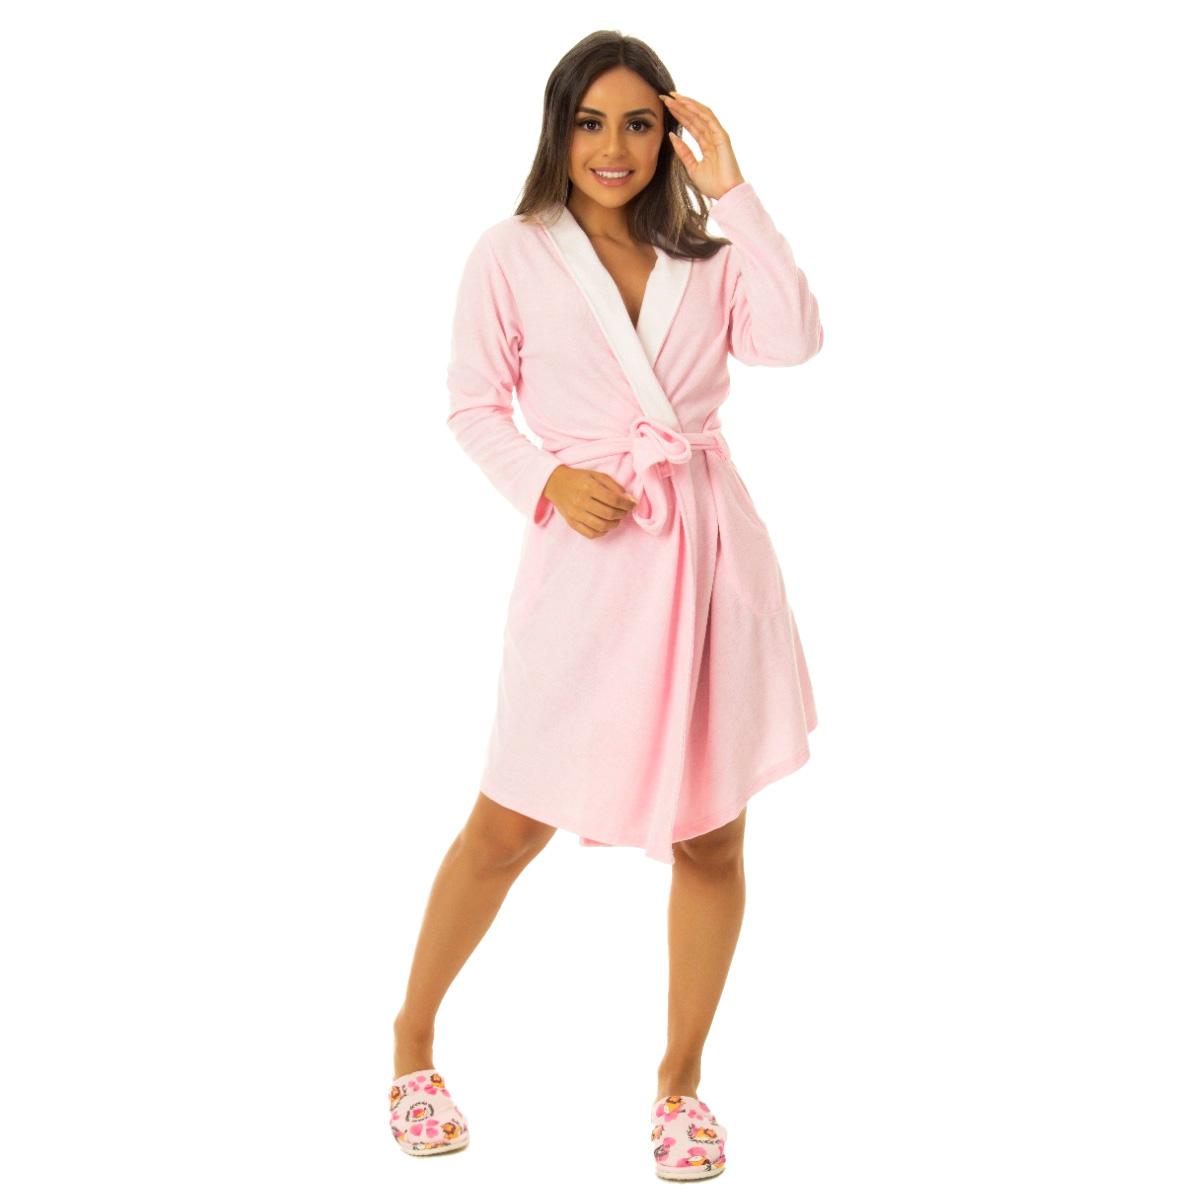 Robe feminino em plush Victory